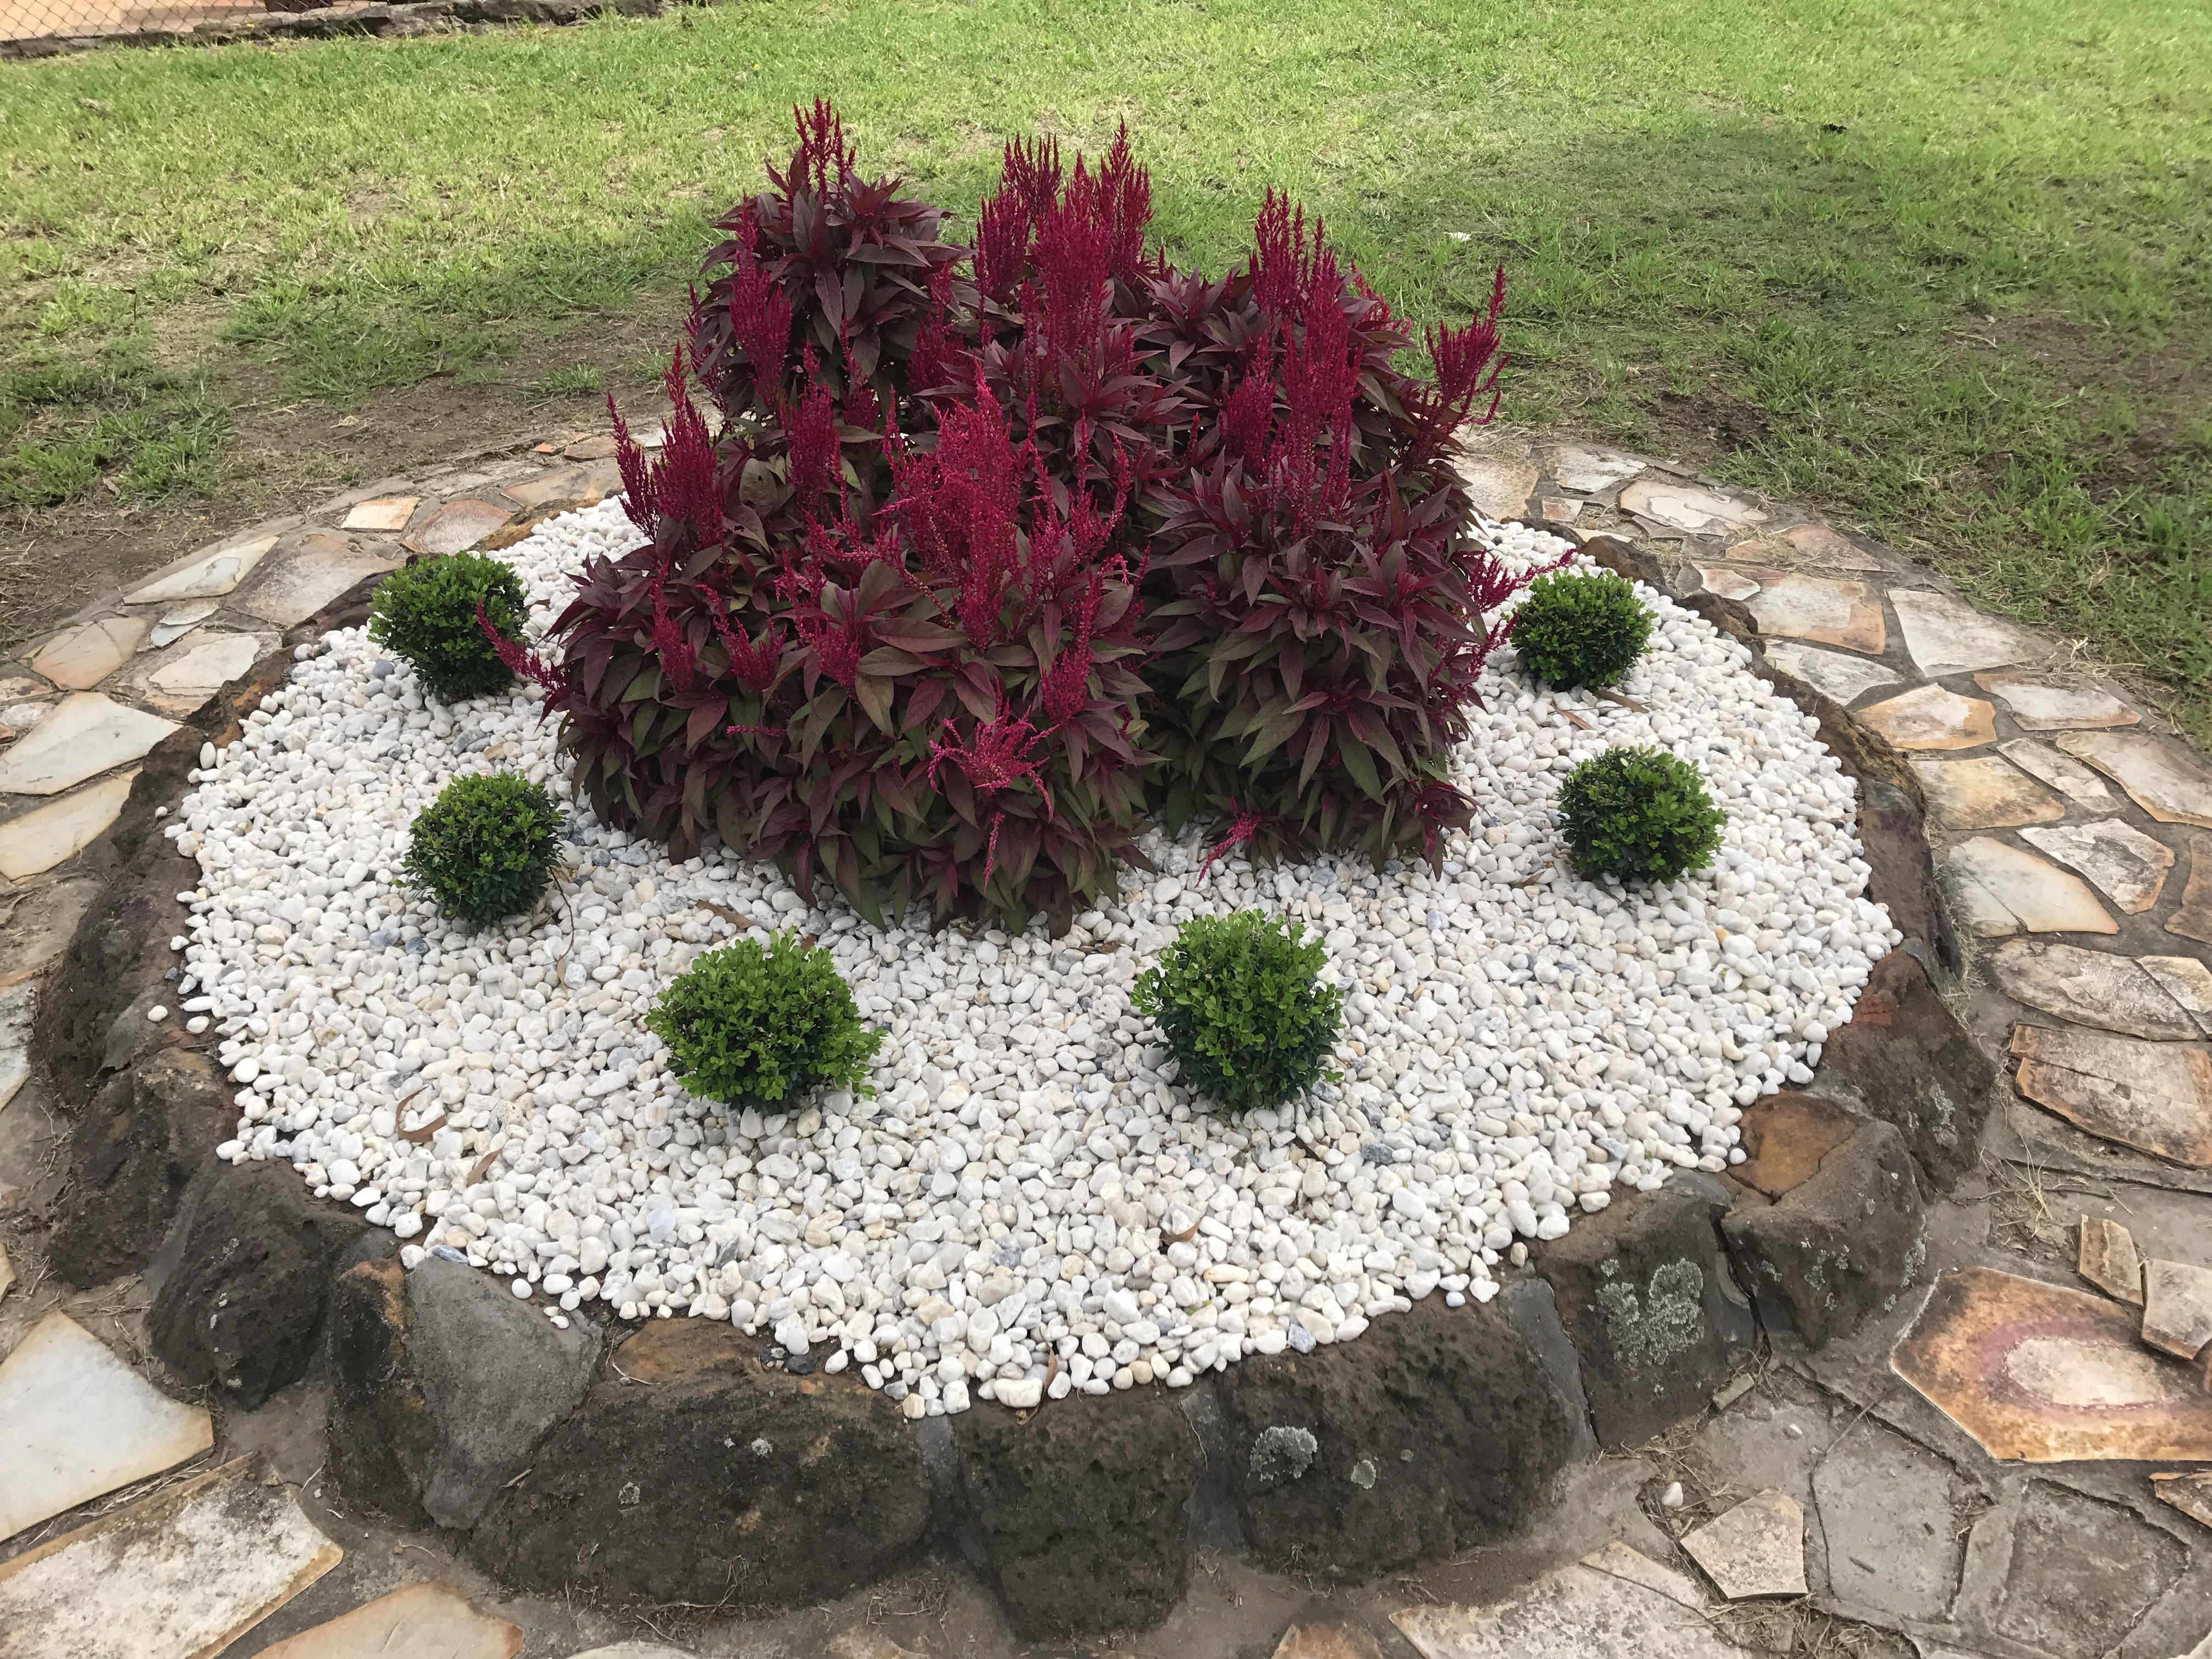 celosia dragons breath with buxus micro garden design